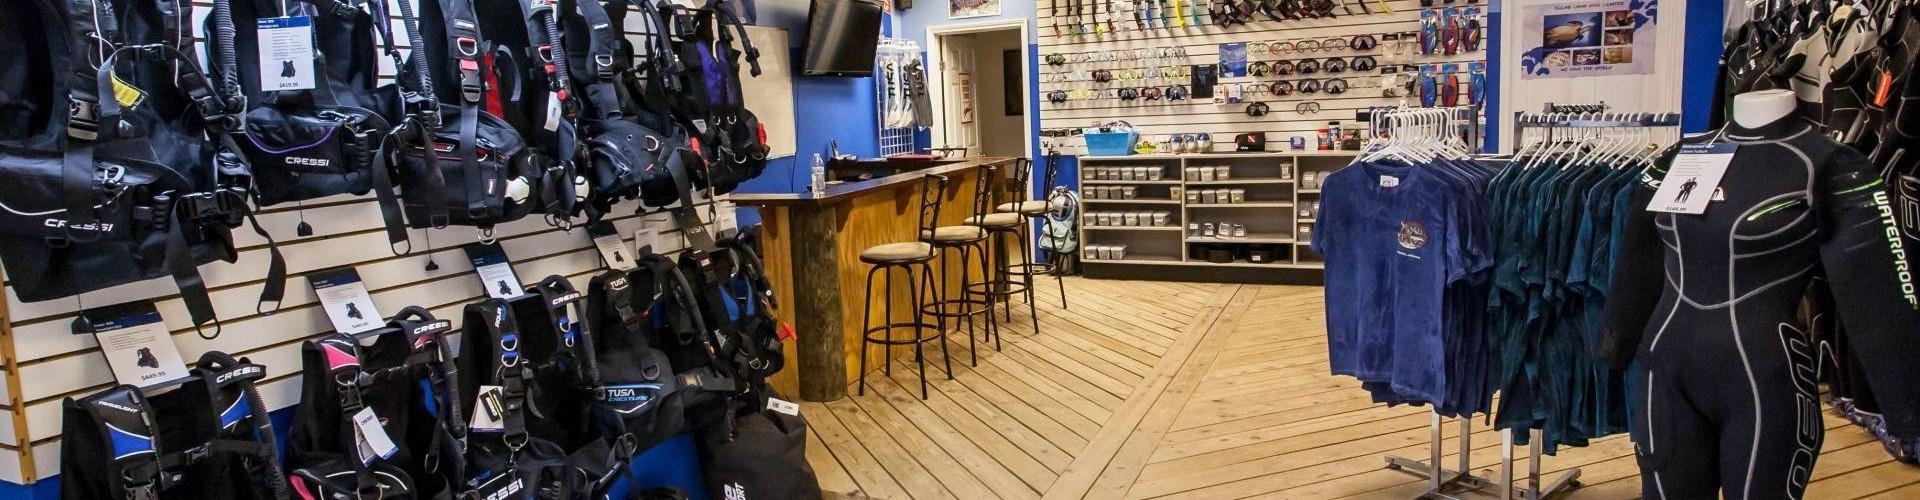 Sugar Land Dive Center Store Photo